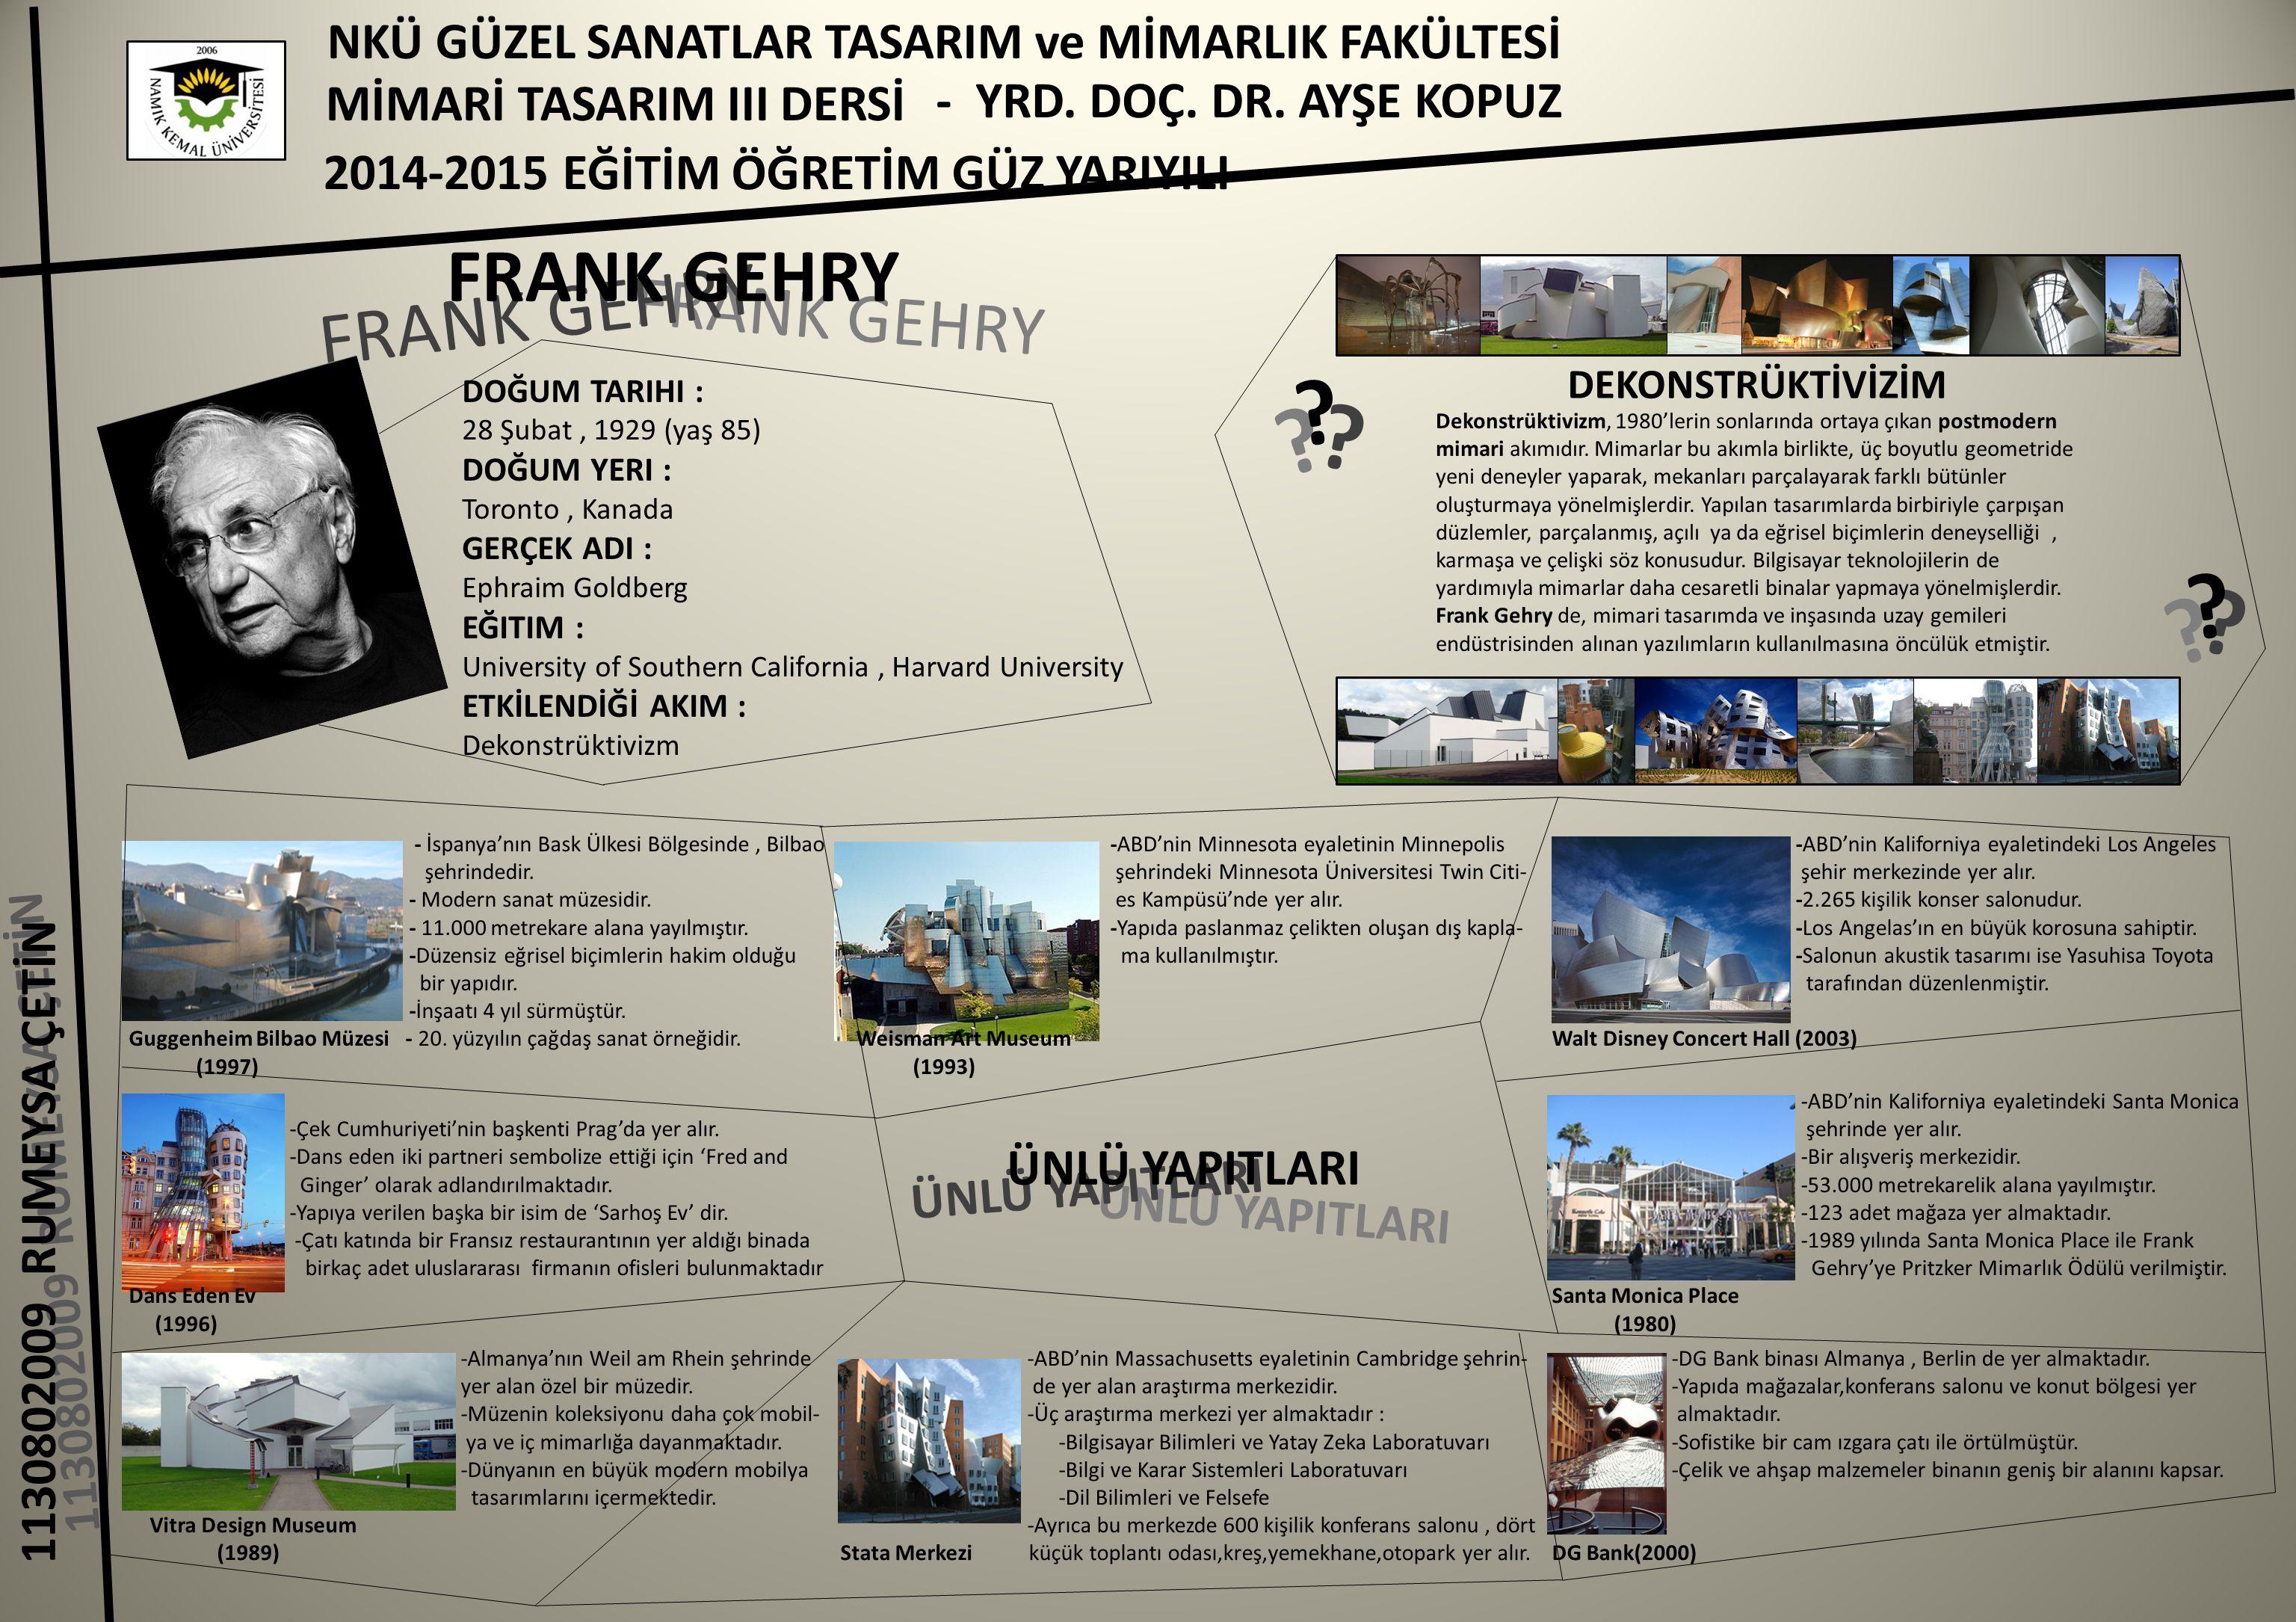 FRANK GEHRY FRANK GEHRY FRANK GEHRY